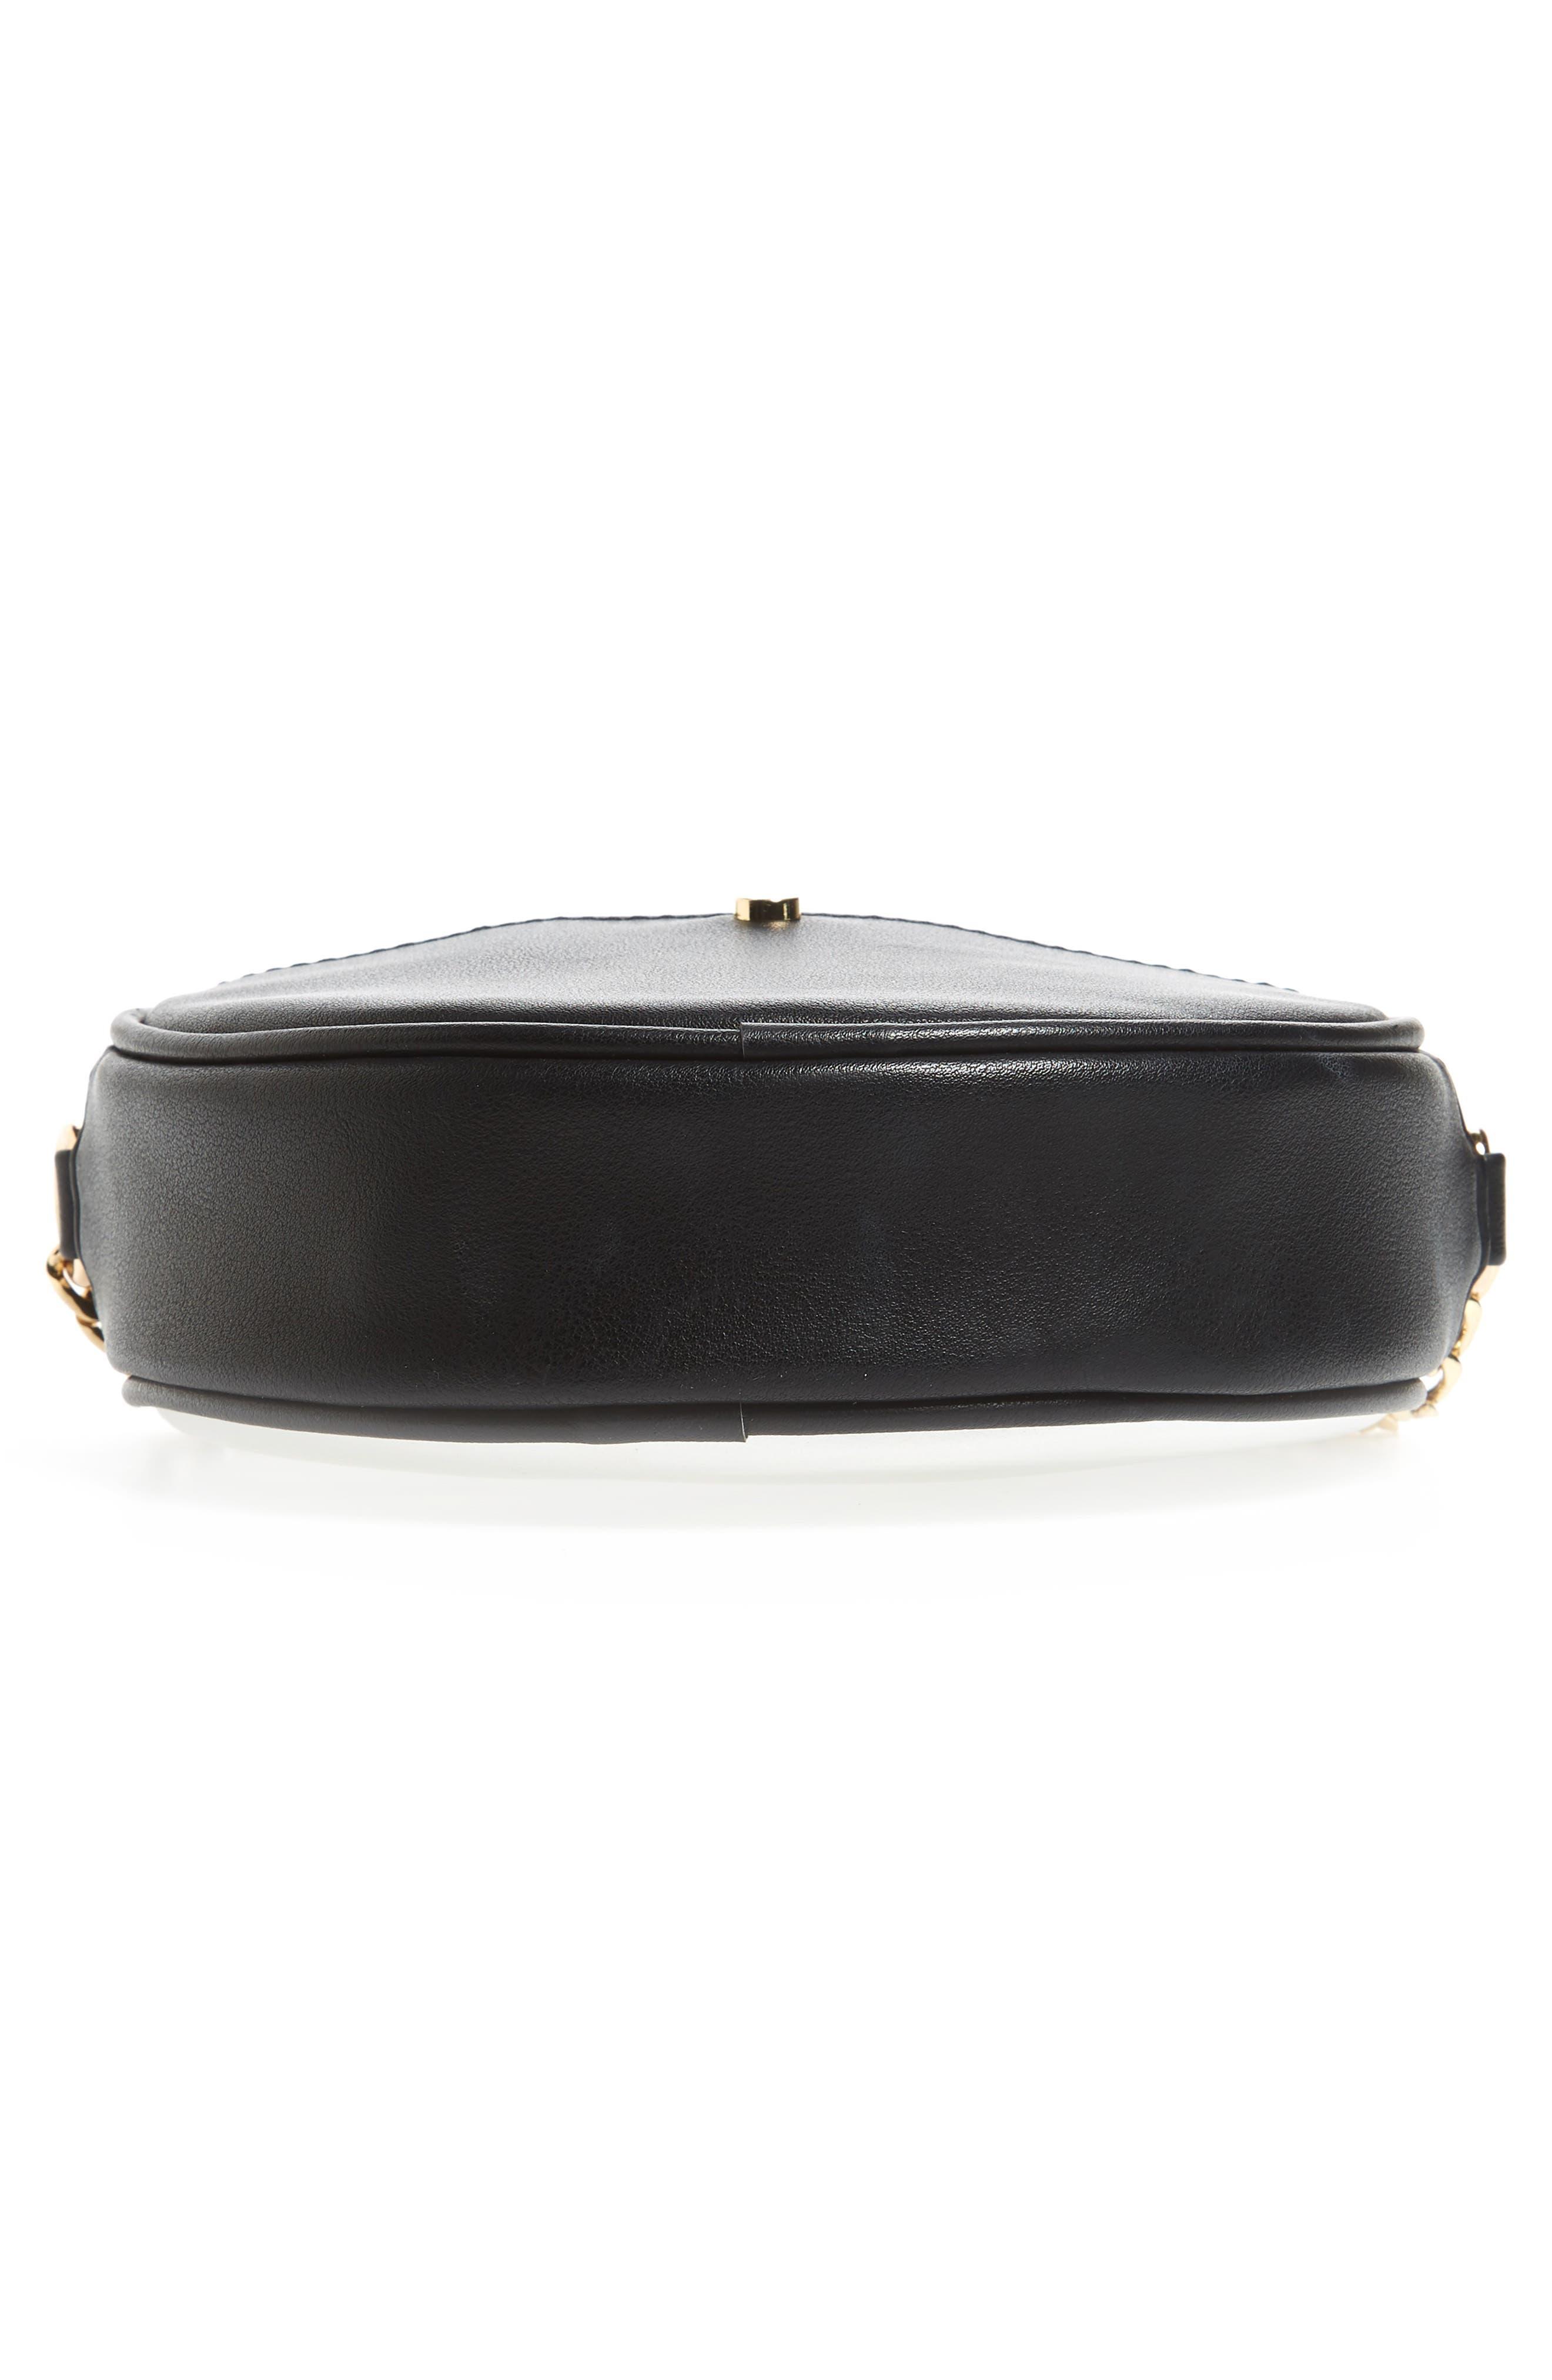 Mali + Lili Payton Vegan Leather Canteen Crossbody Bag,                             Alternate thumbnail 6, color,                             Black/ White